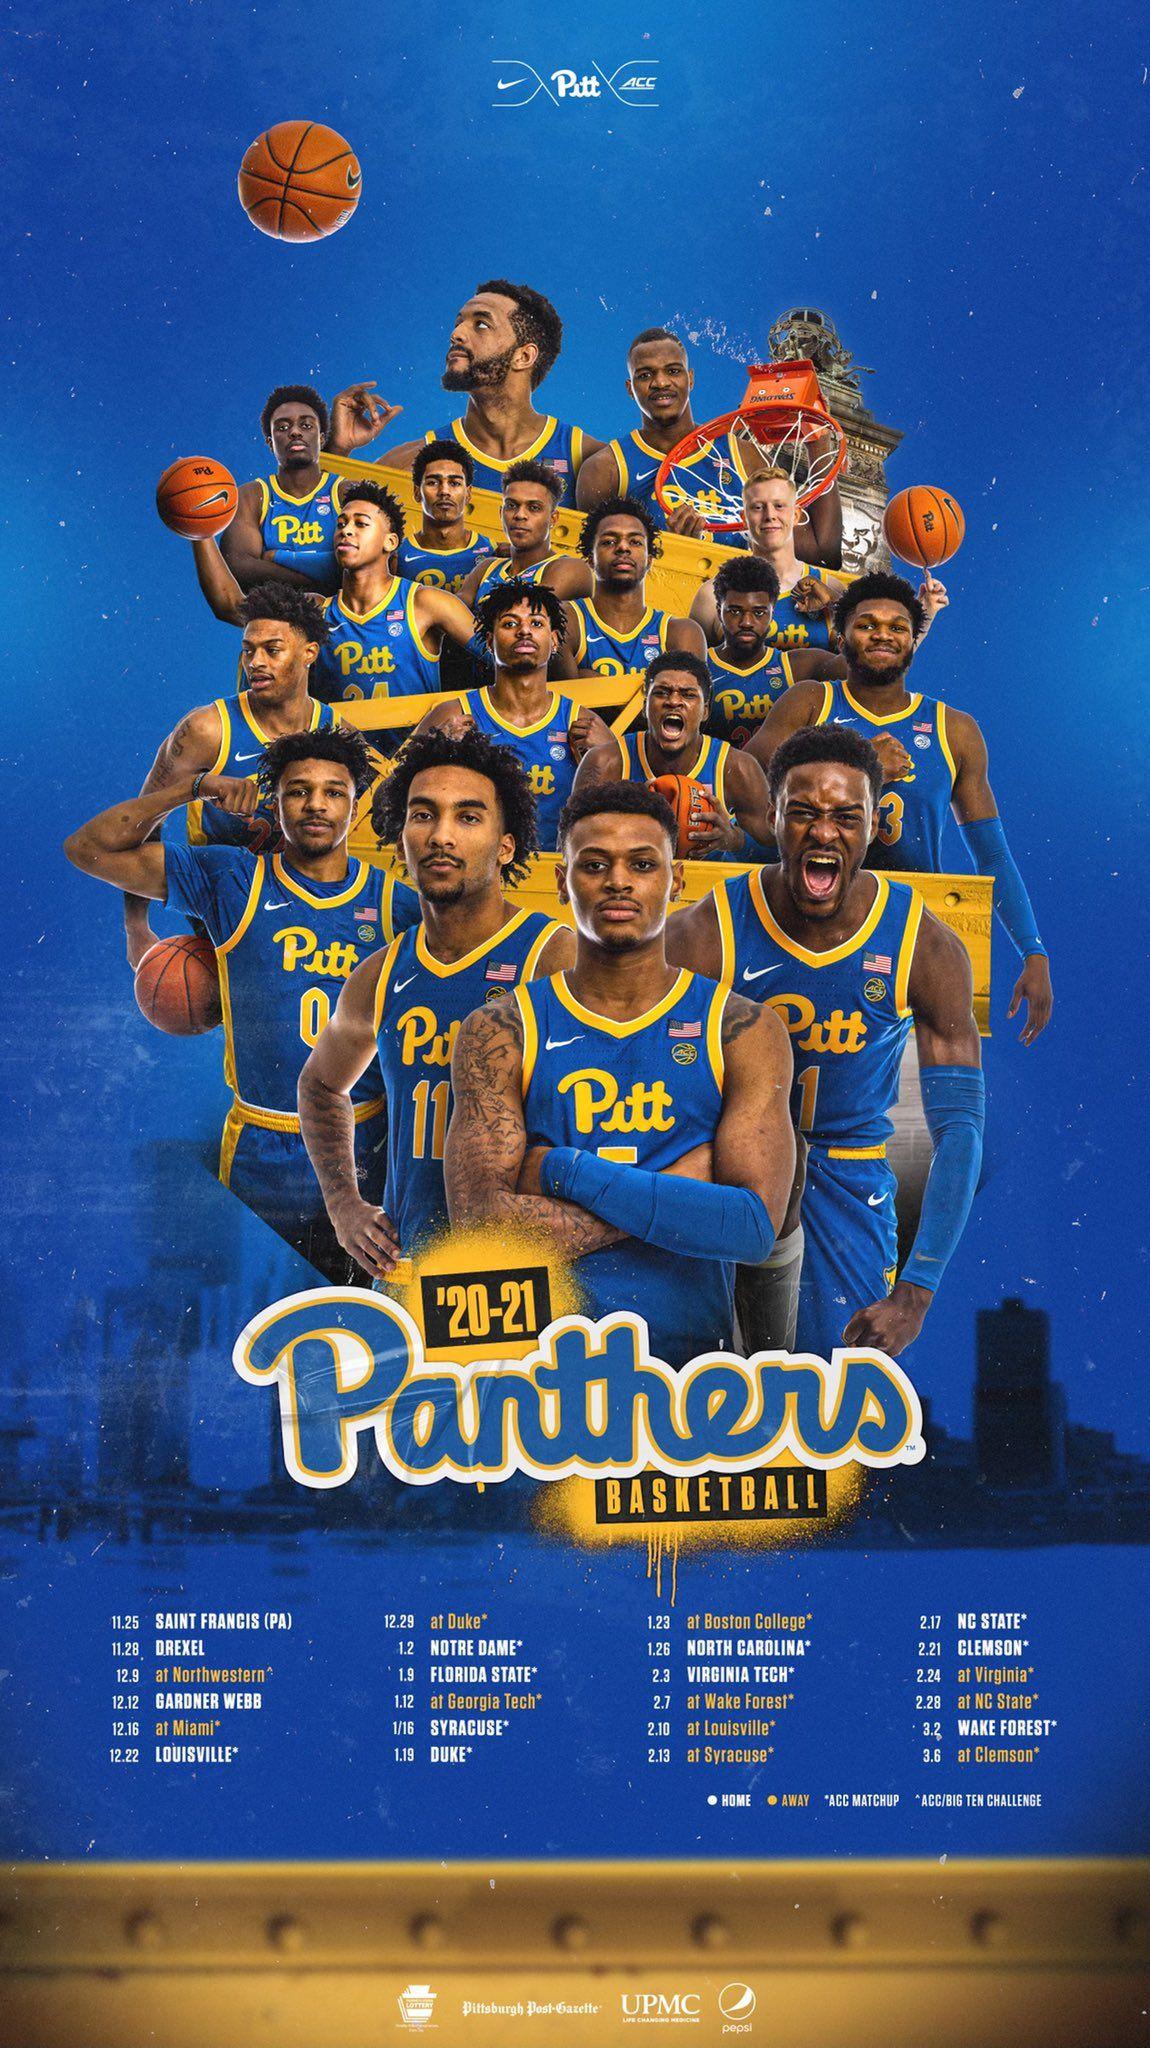 Virginia Tech Pittsburgh Basketball